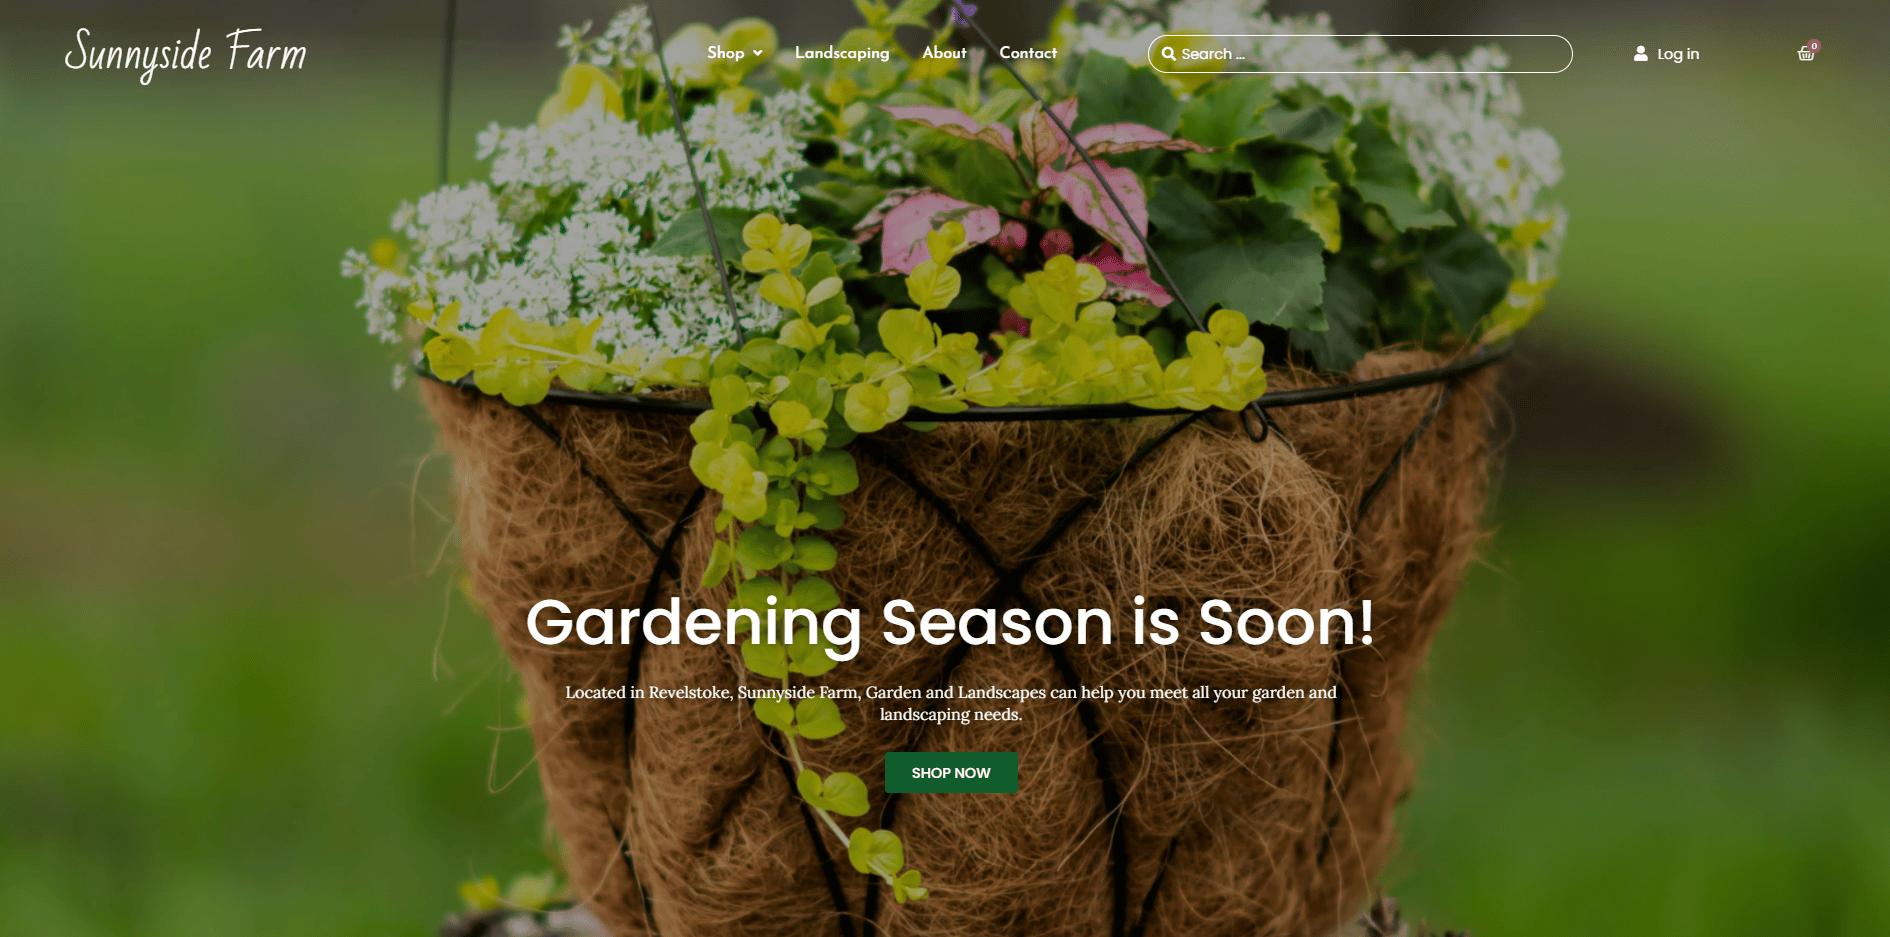 Screenshot of the Sunnyside Farm Website